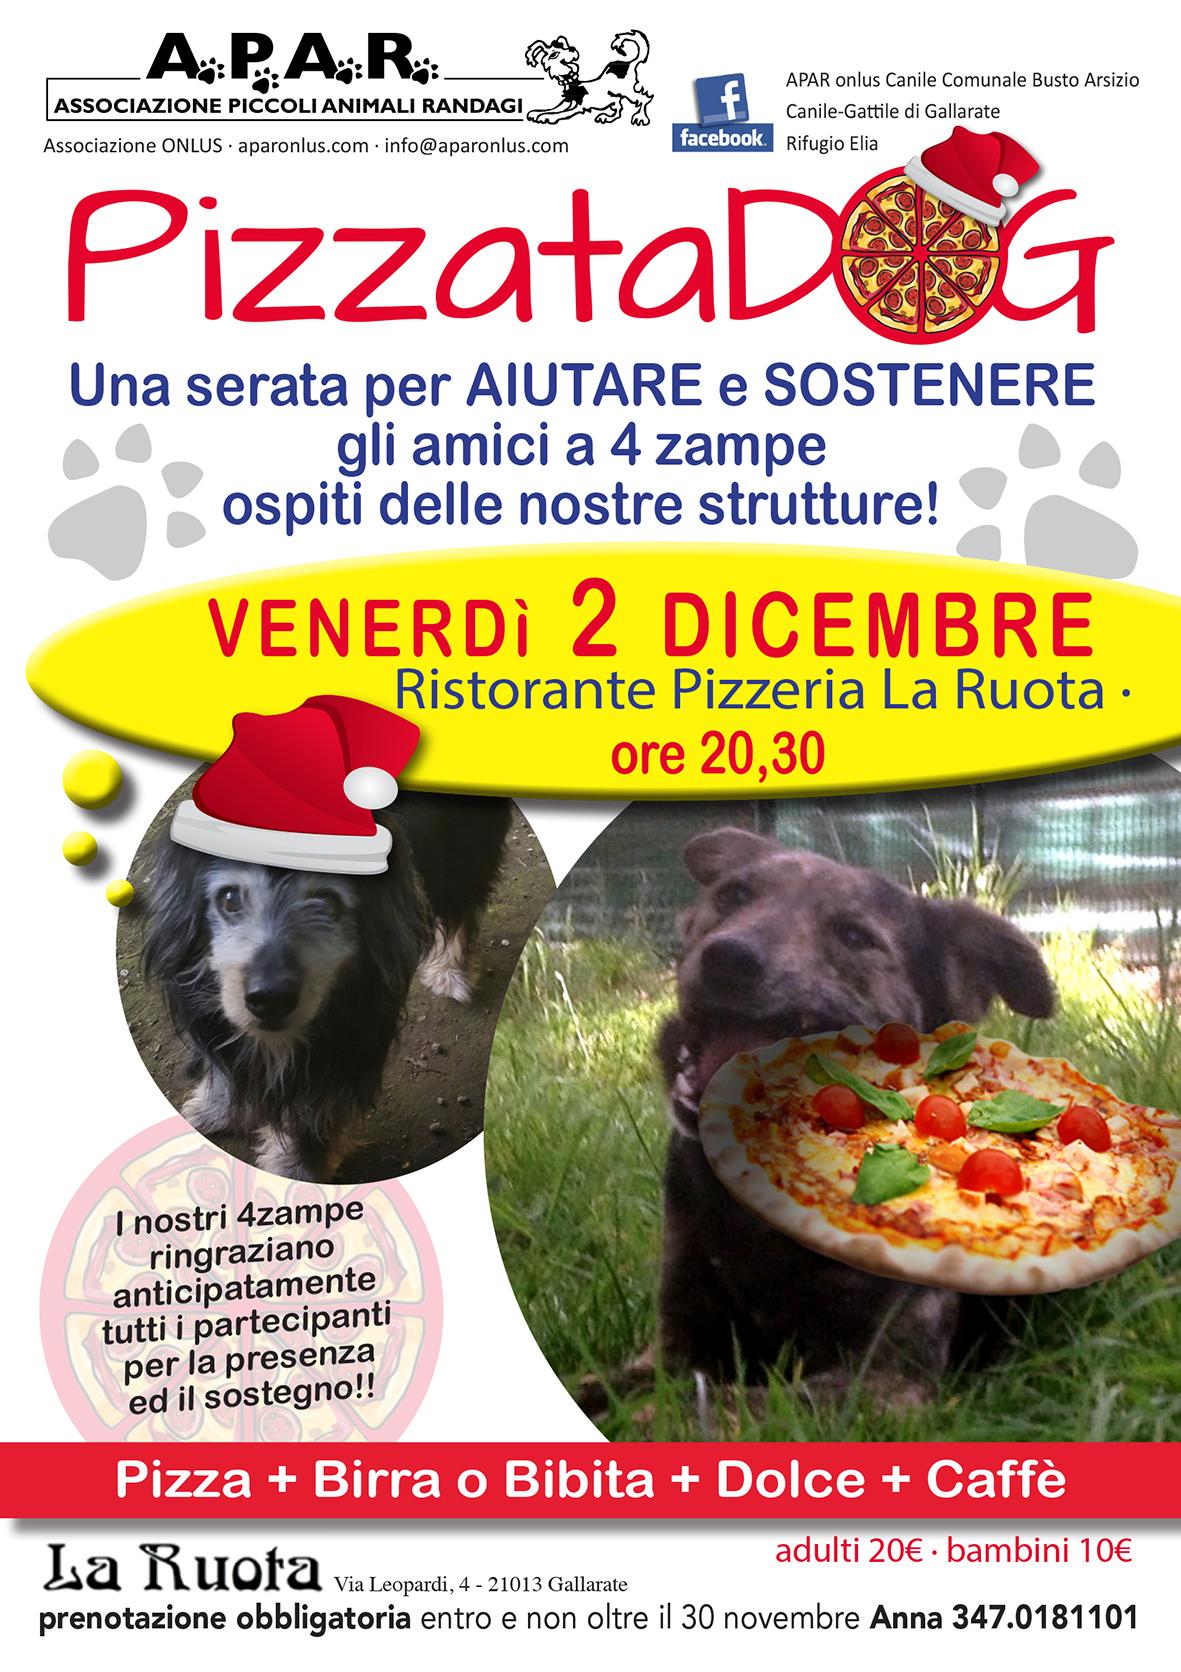 Pizzadog!